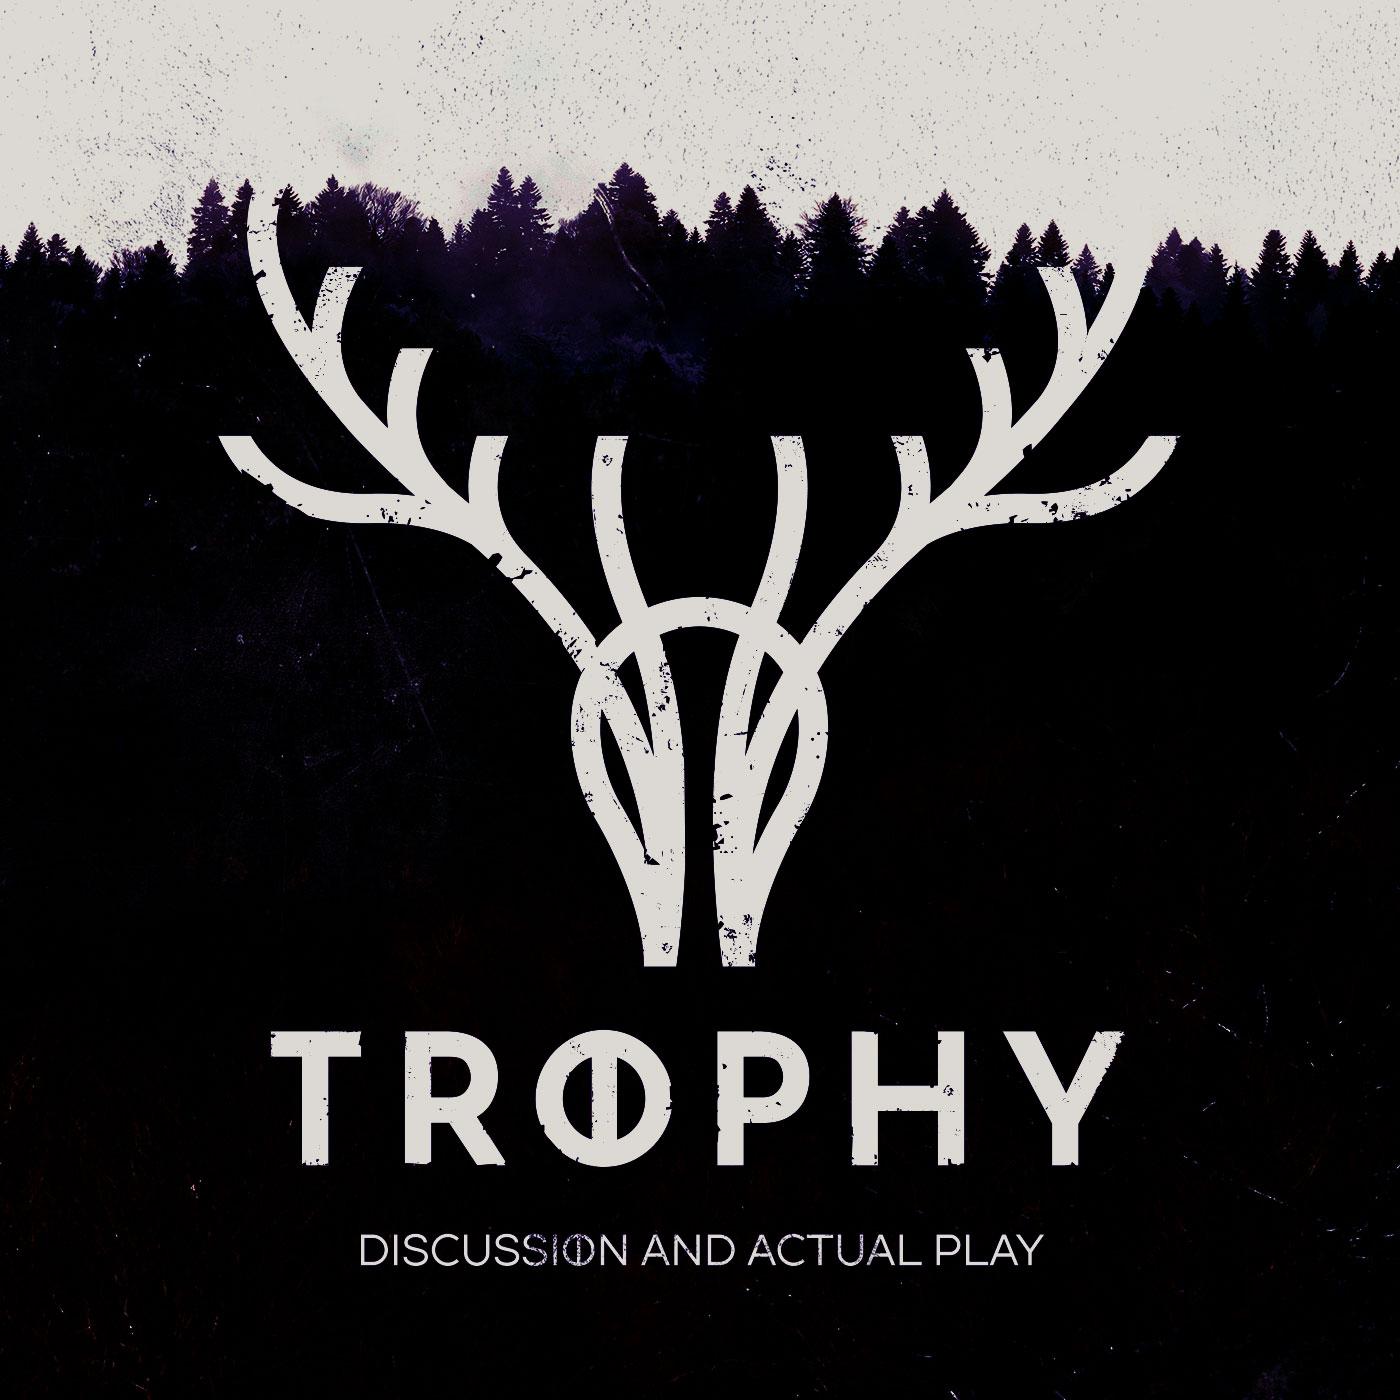 Trophy show art